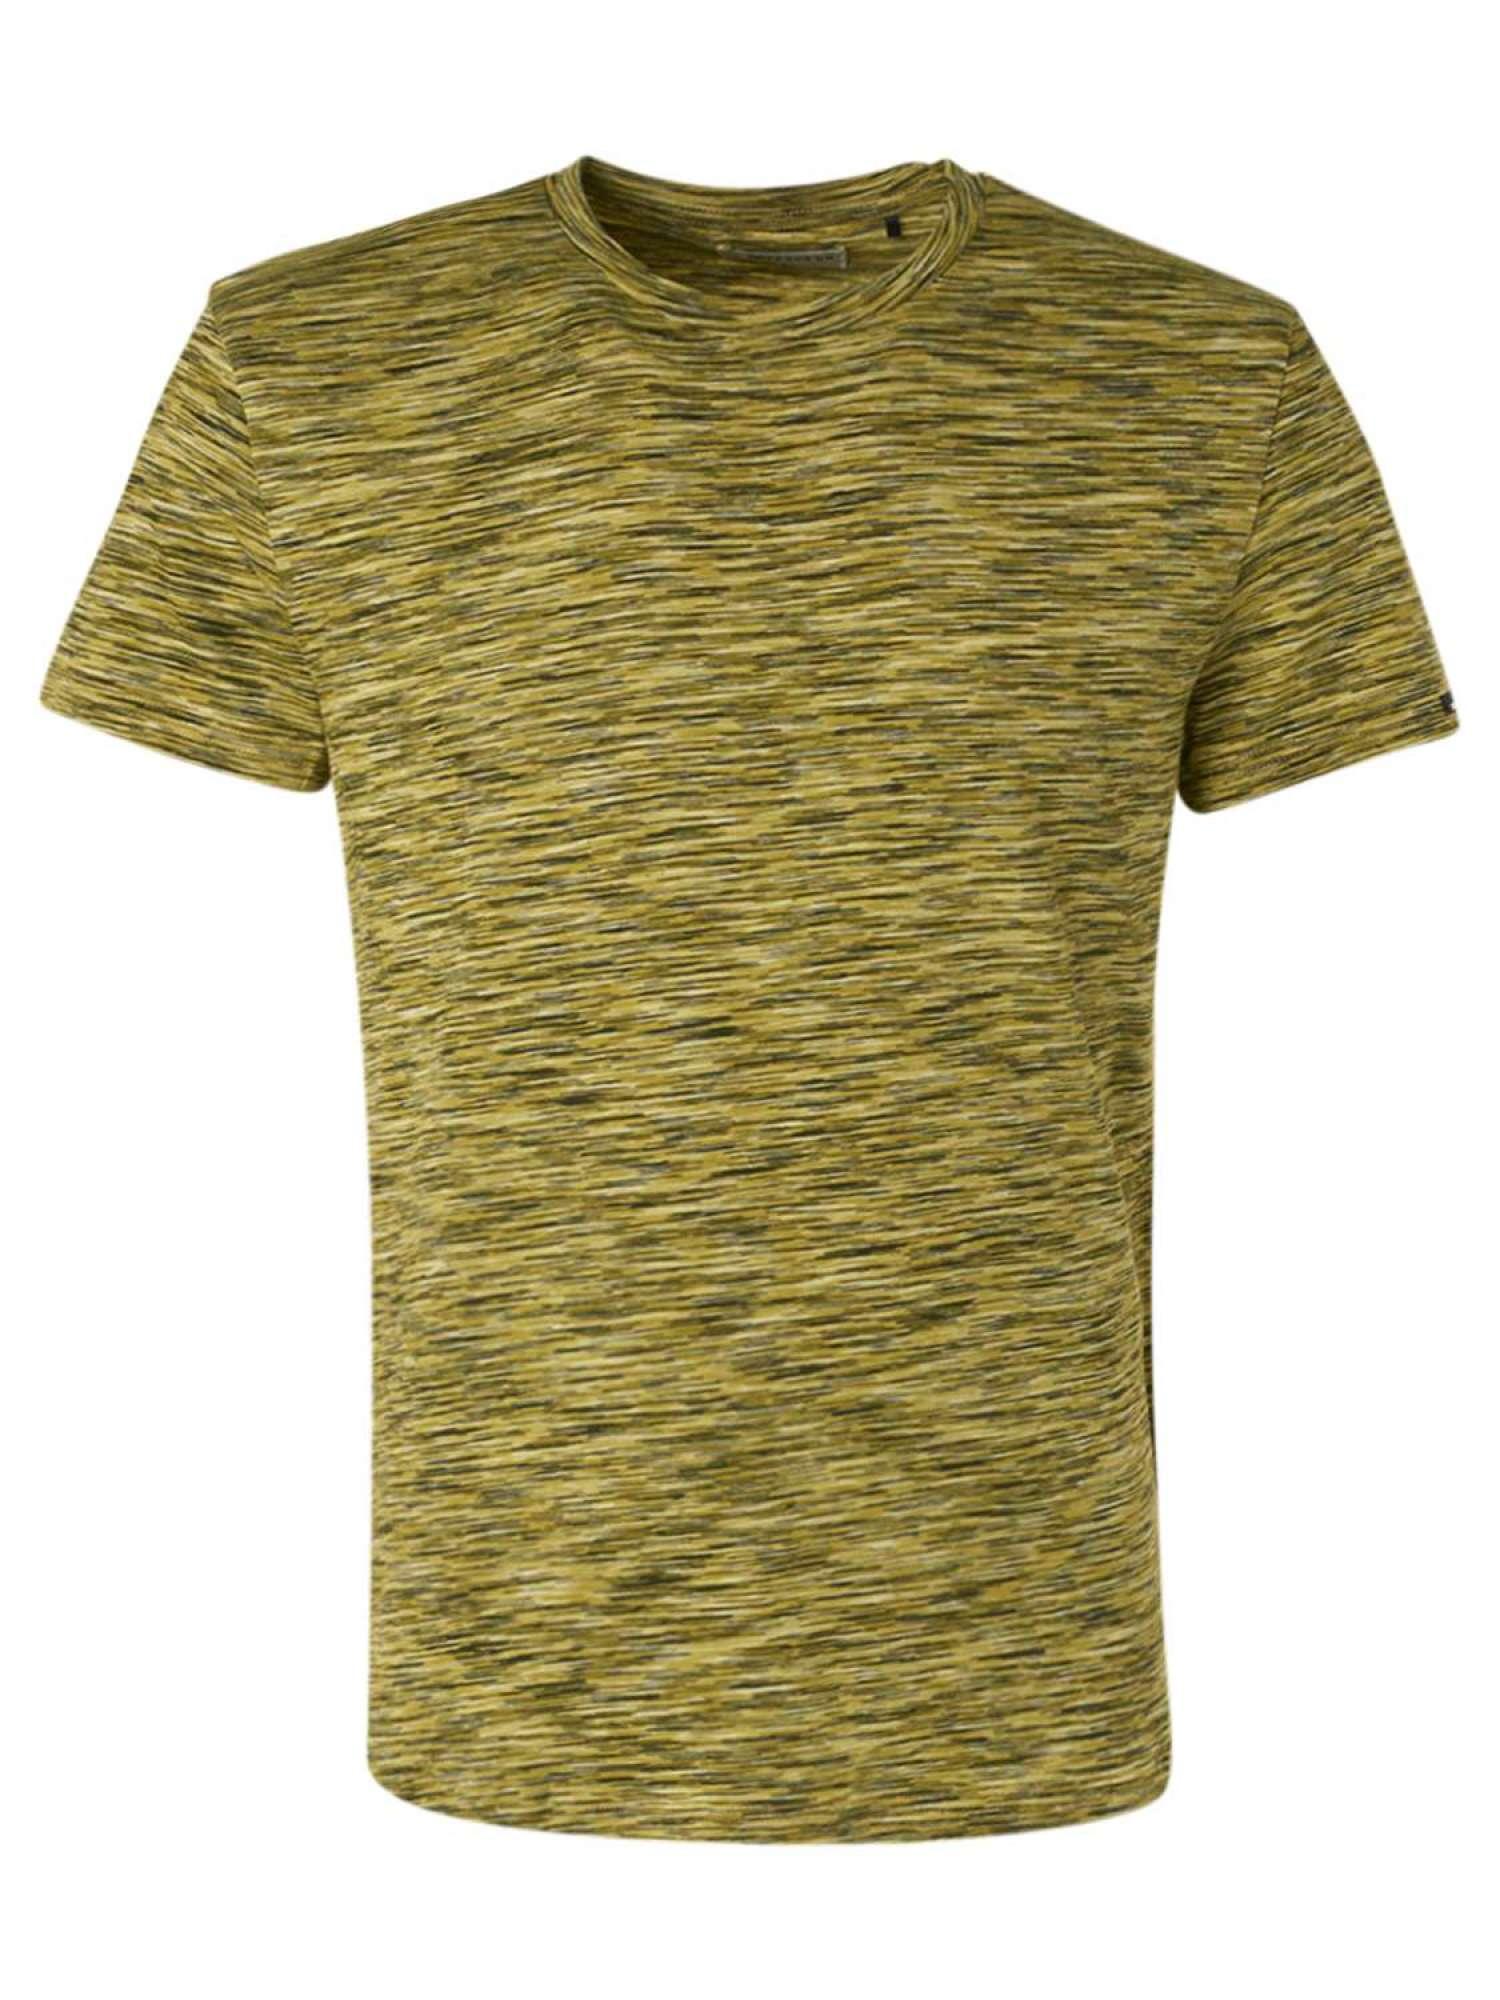 T-shirt crewneck multi coloured yar lime